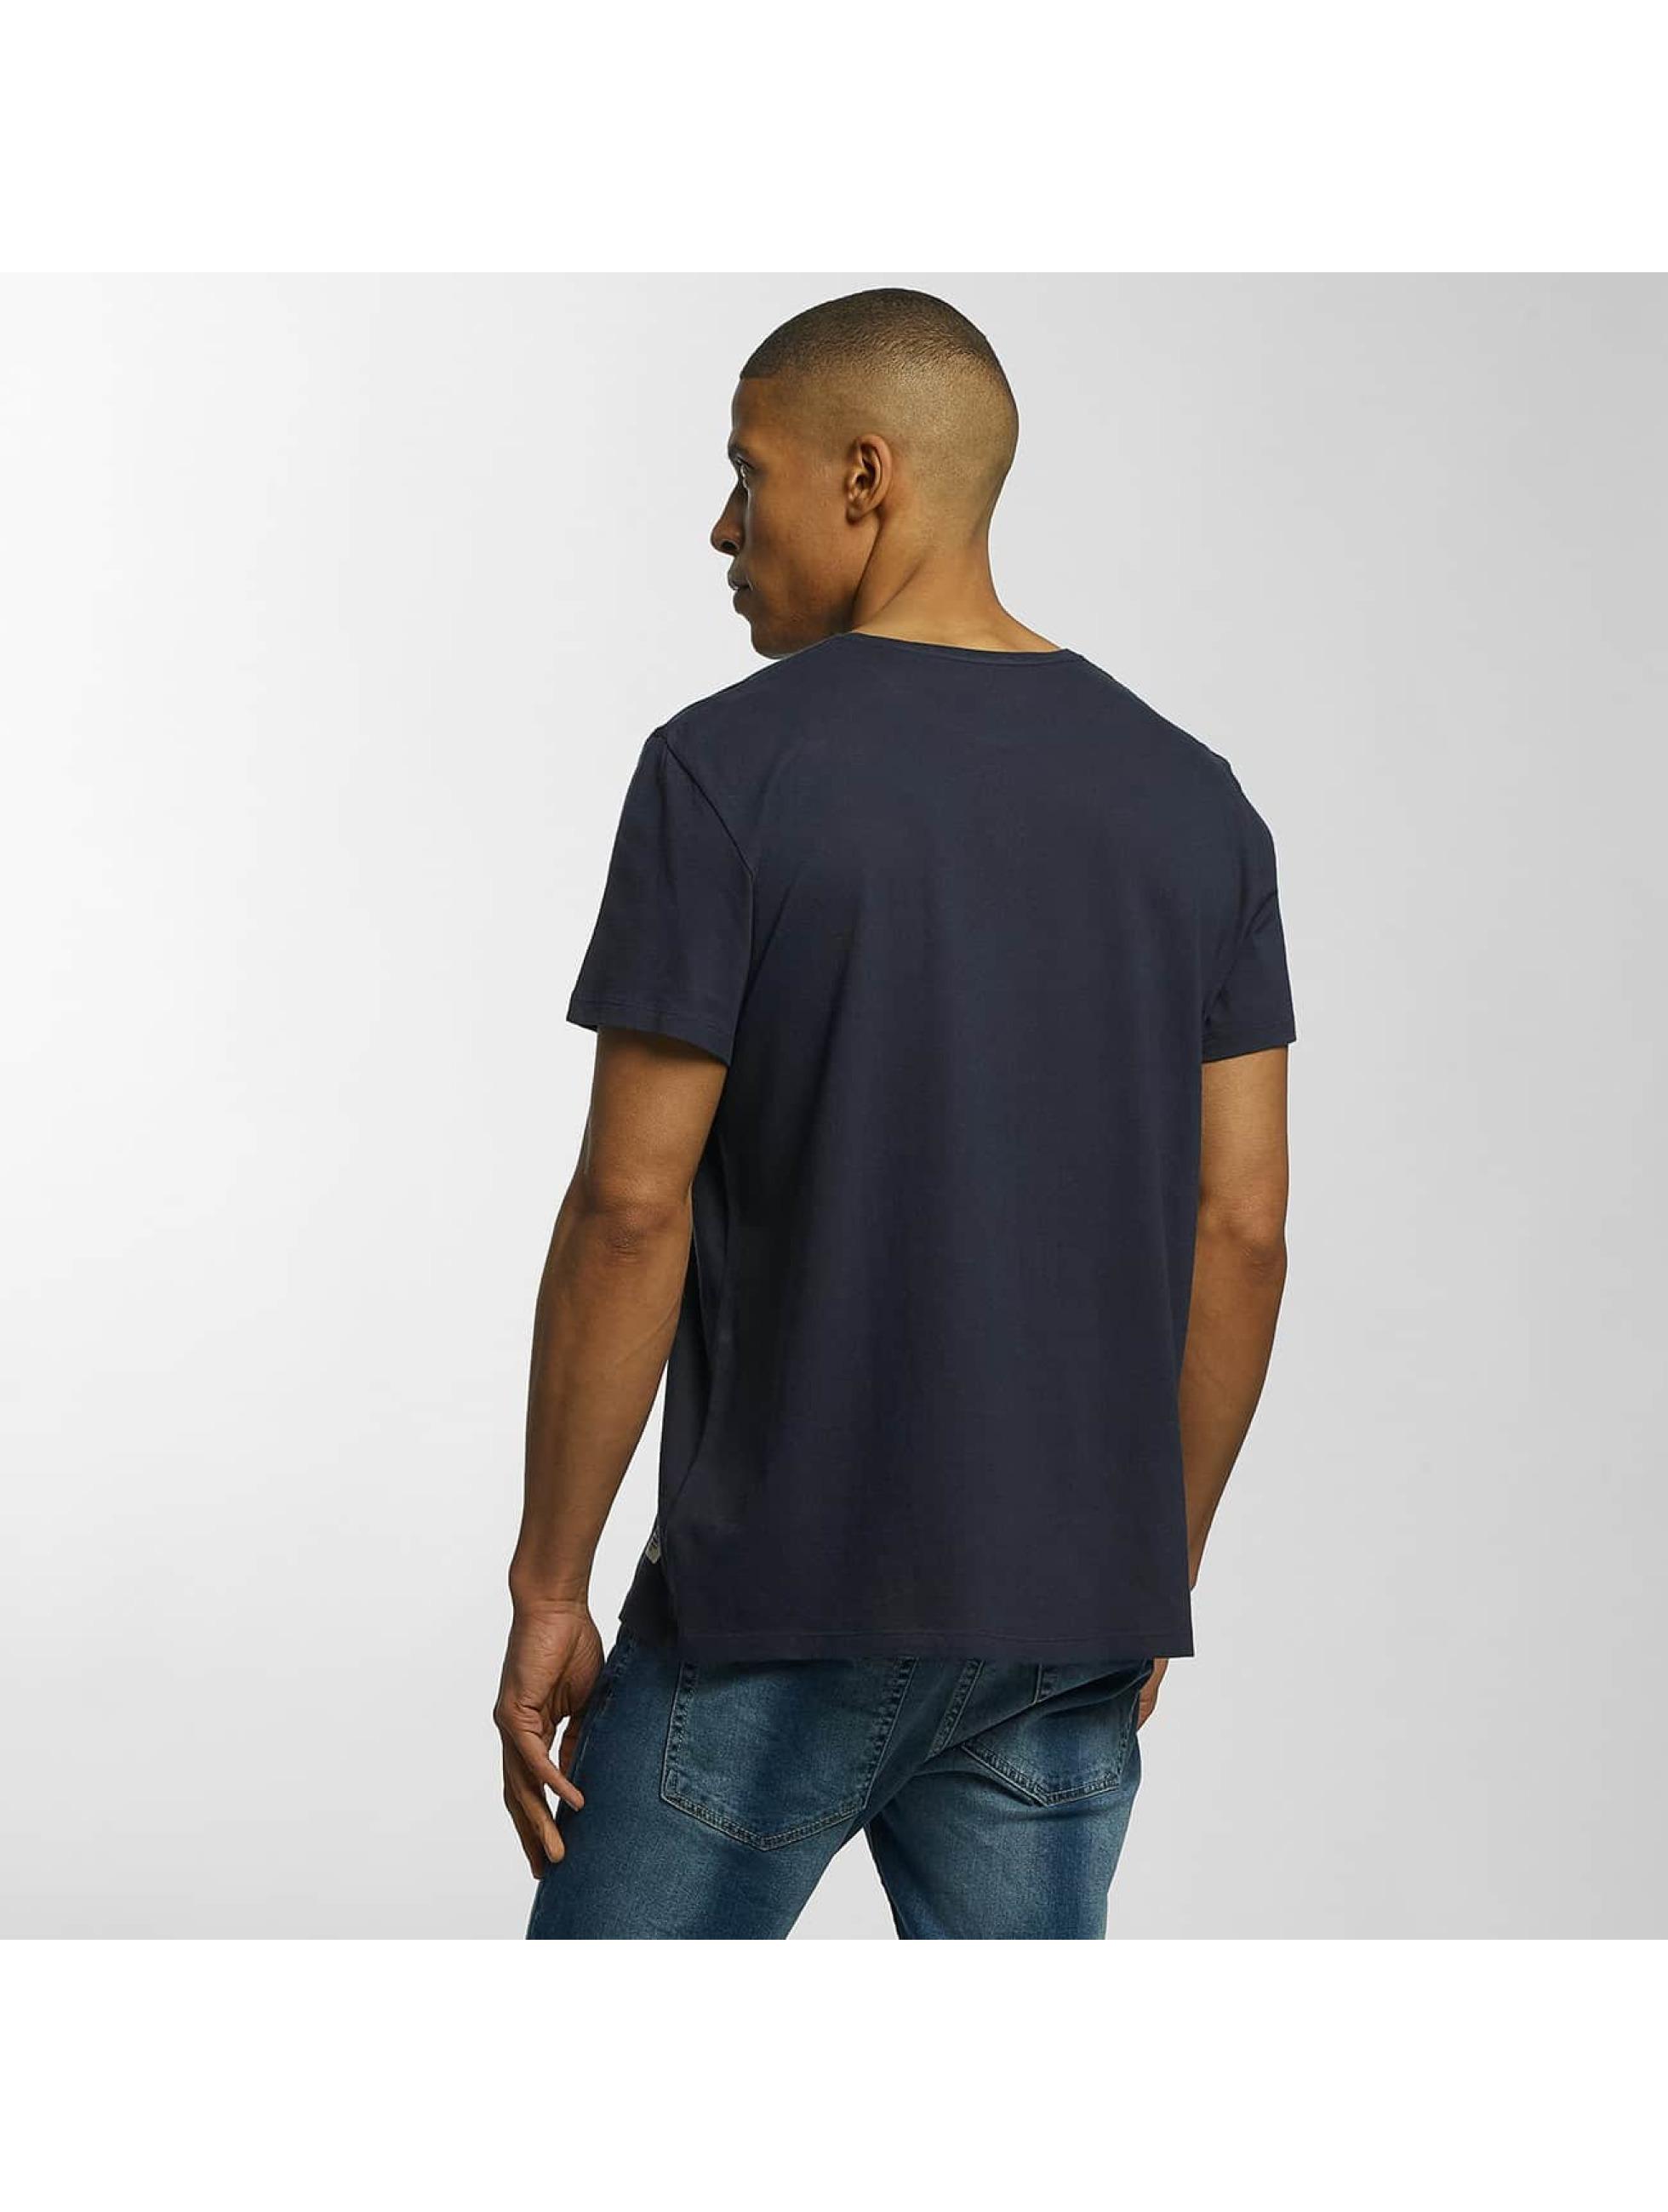 Timberland T-Shirt Big Logo grau